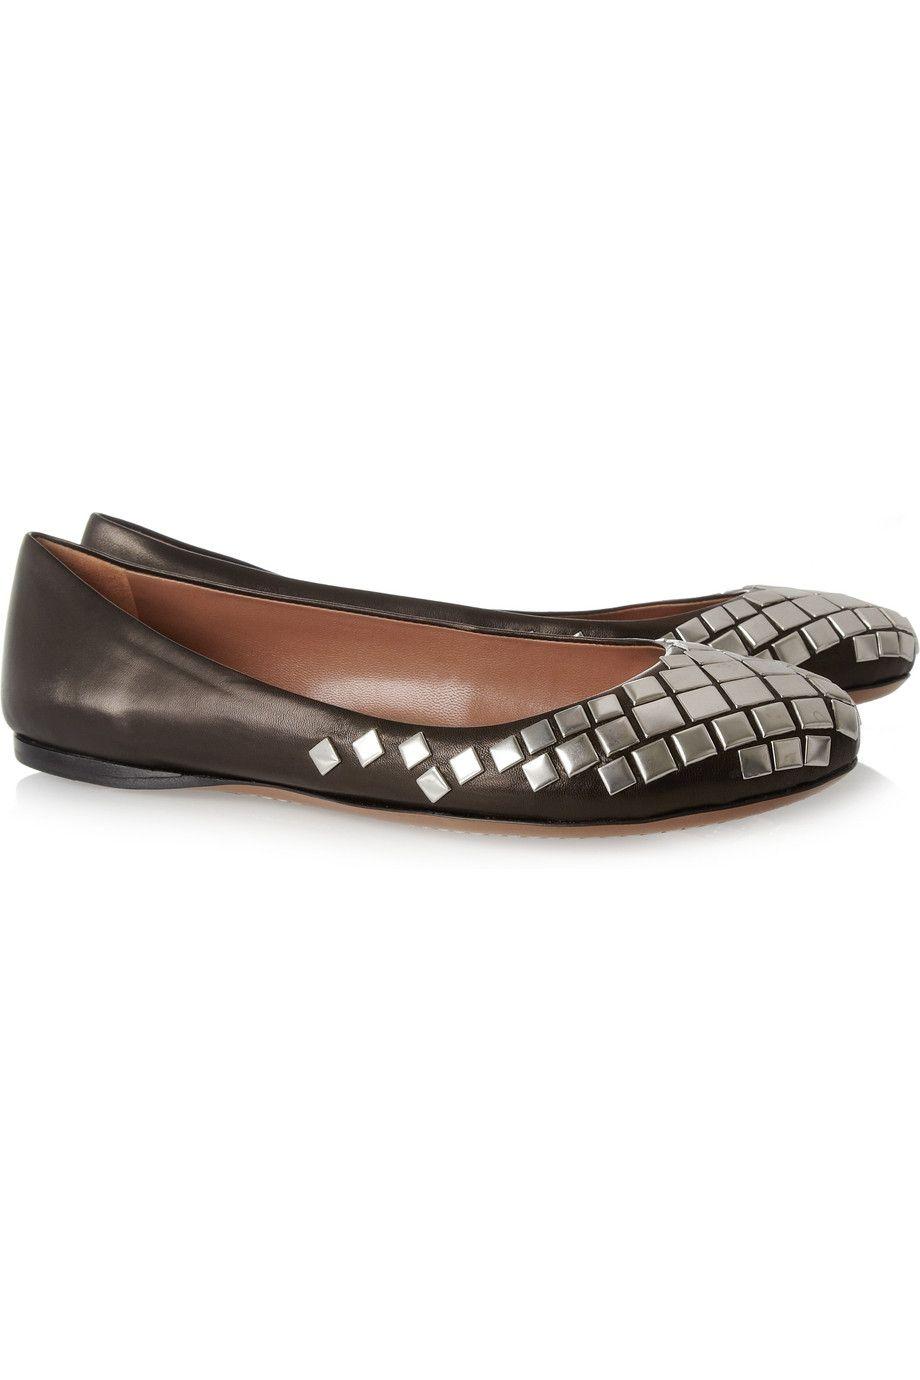 Alaïa Studded Leather Flats 2014 sale online kF3LeF4BWr